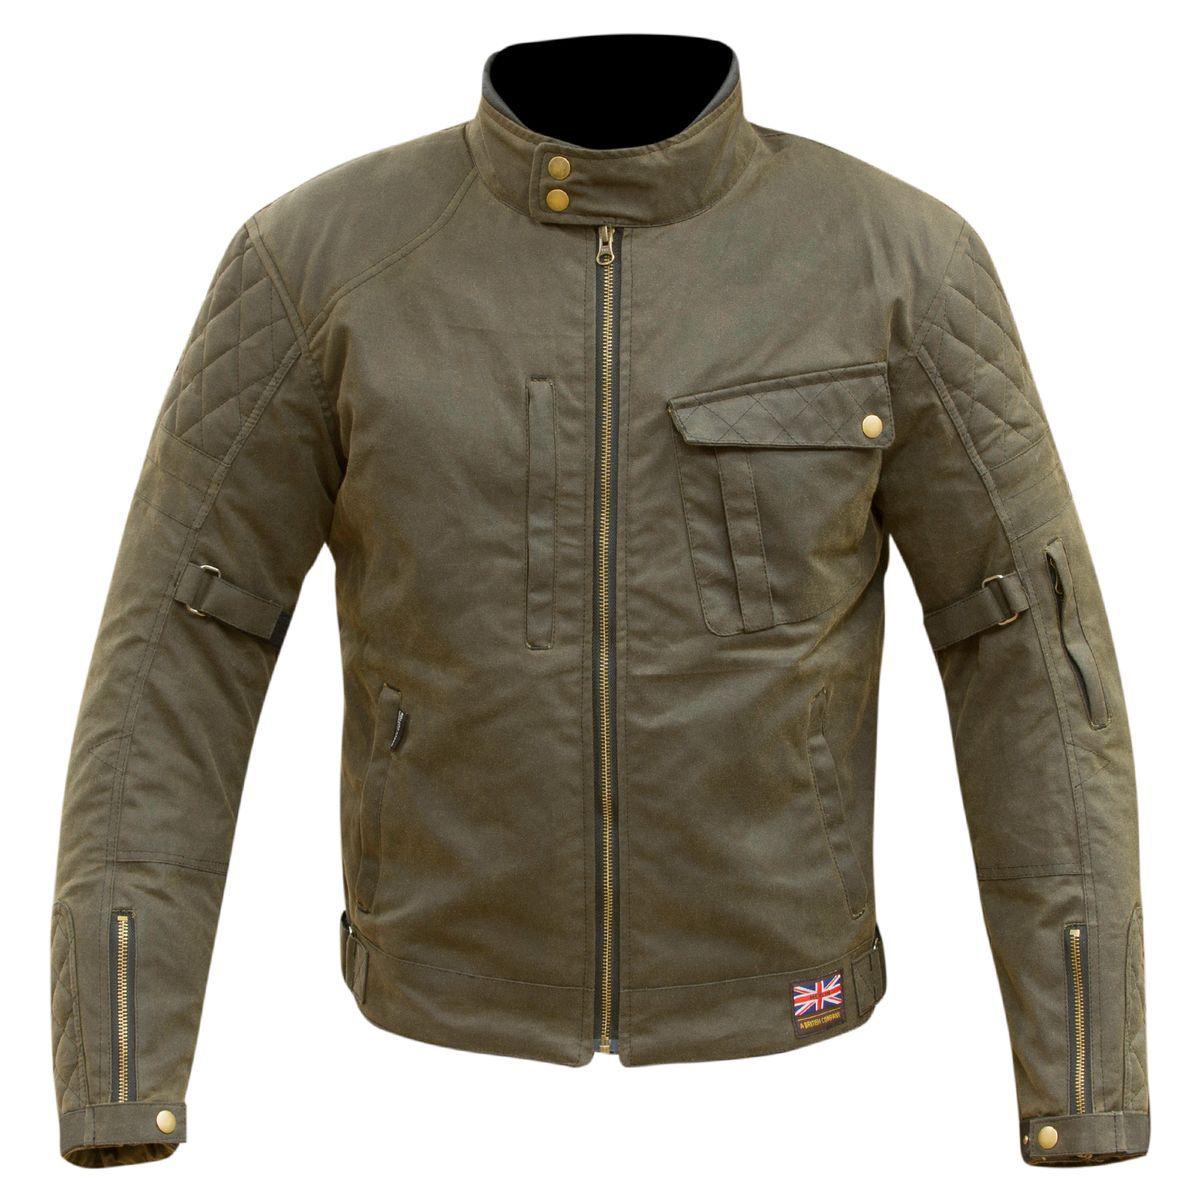 Merlin Elmhurst Wax Jacket in 2020 Jackets, Wax jackets